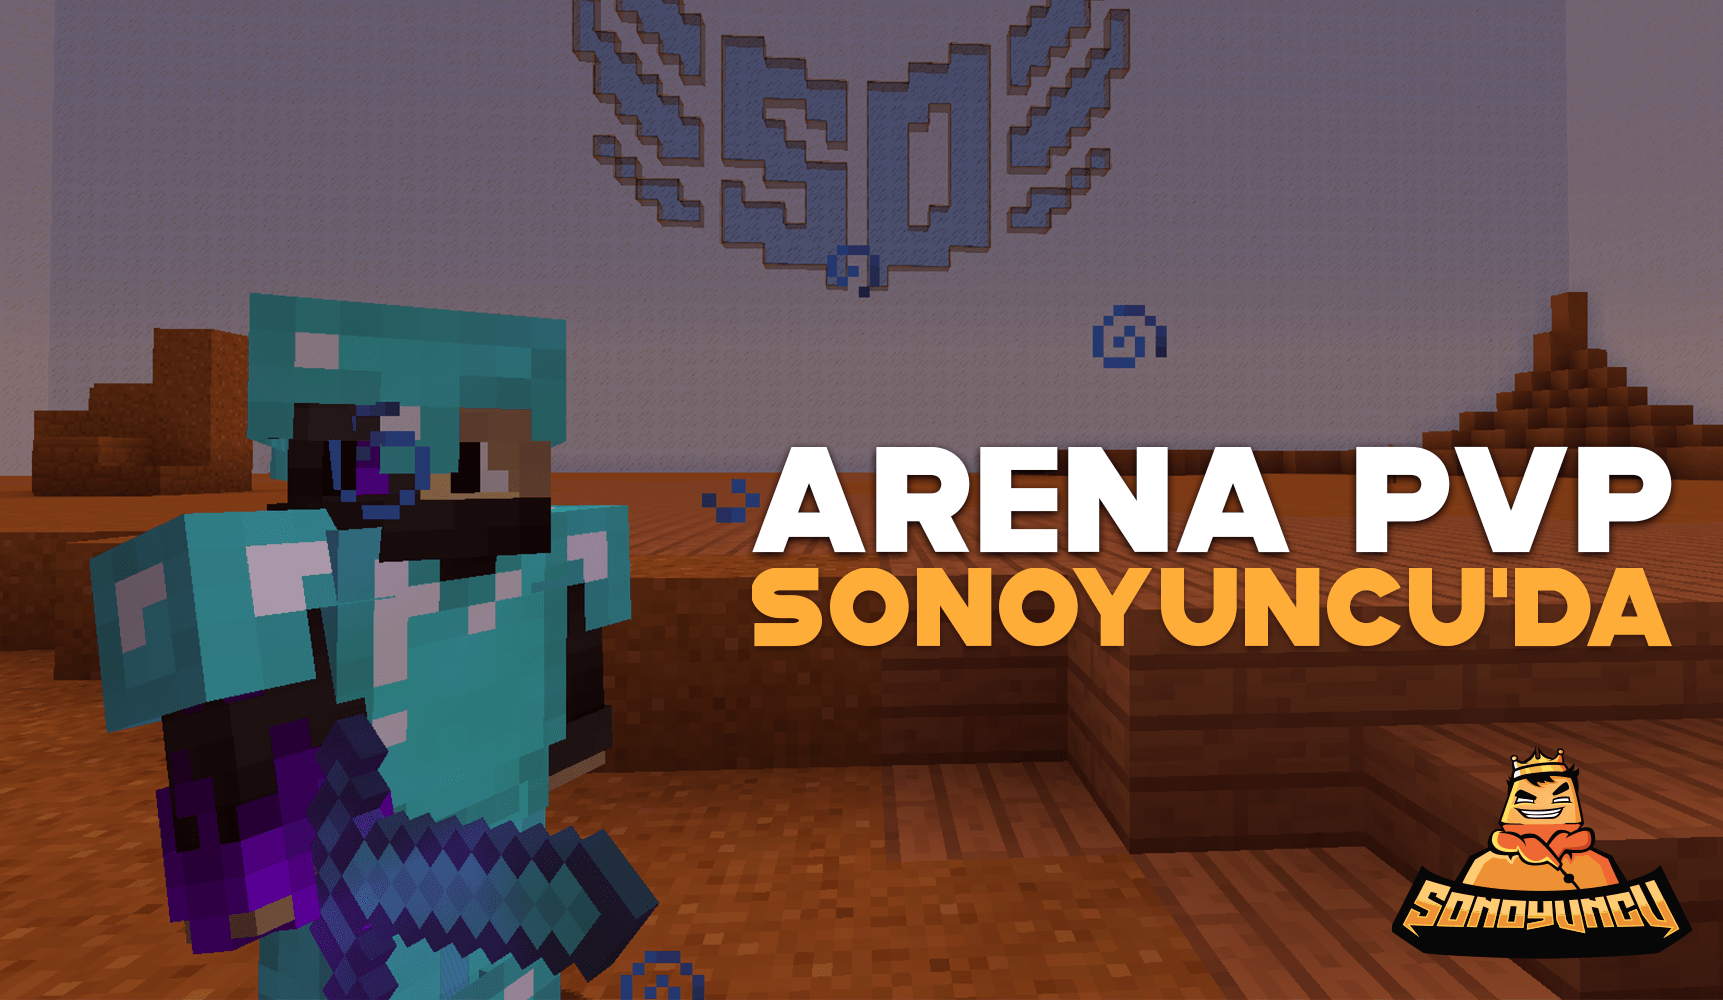 Beklenen Oyun ArenaPVP SonOyuncu'da - Dereceli (Ranked)!